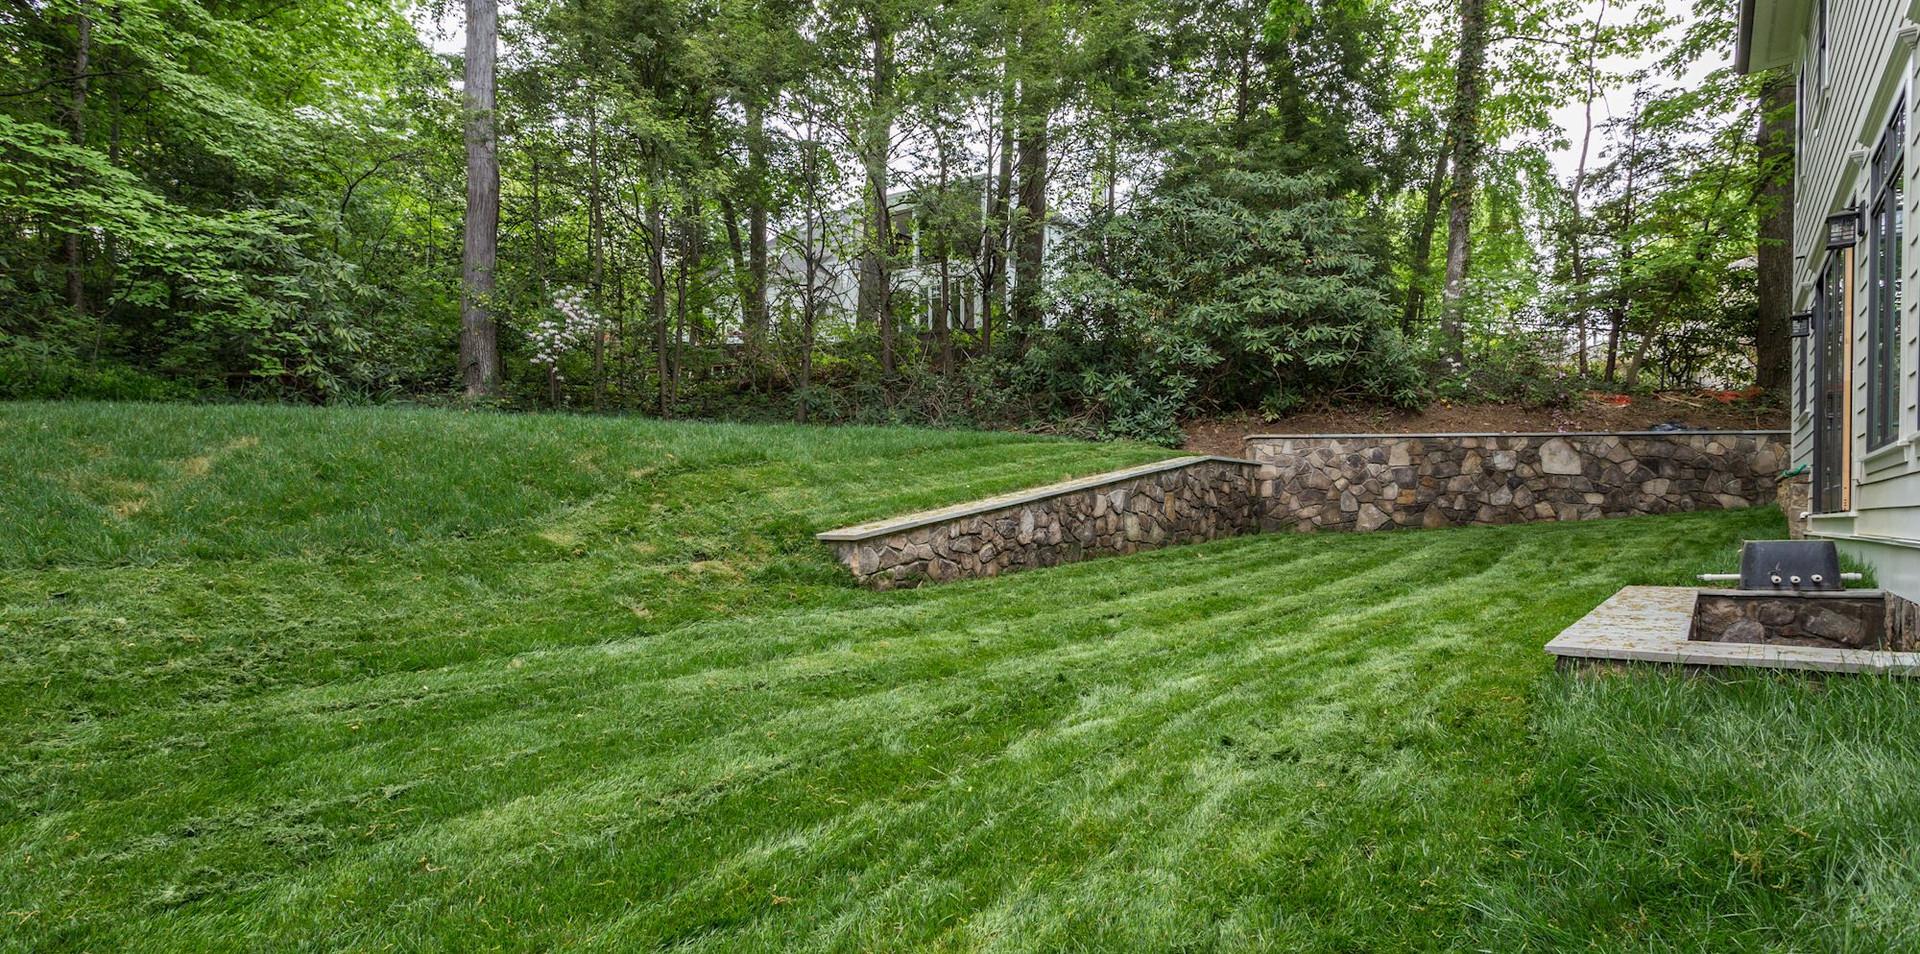 Large bi-level backyard with stone wall